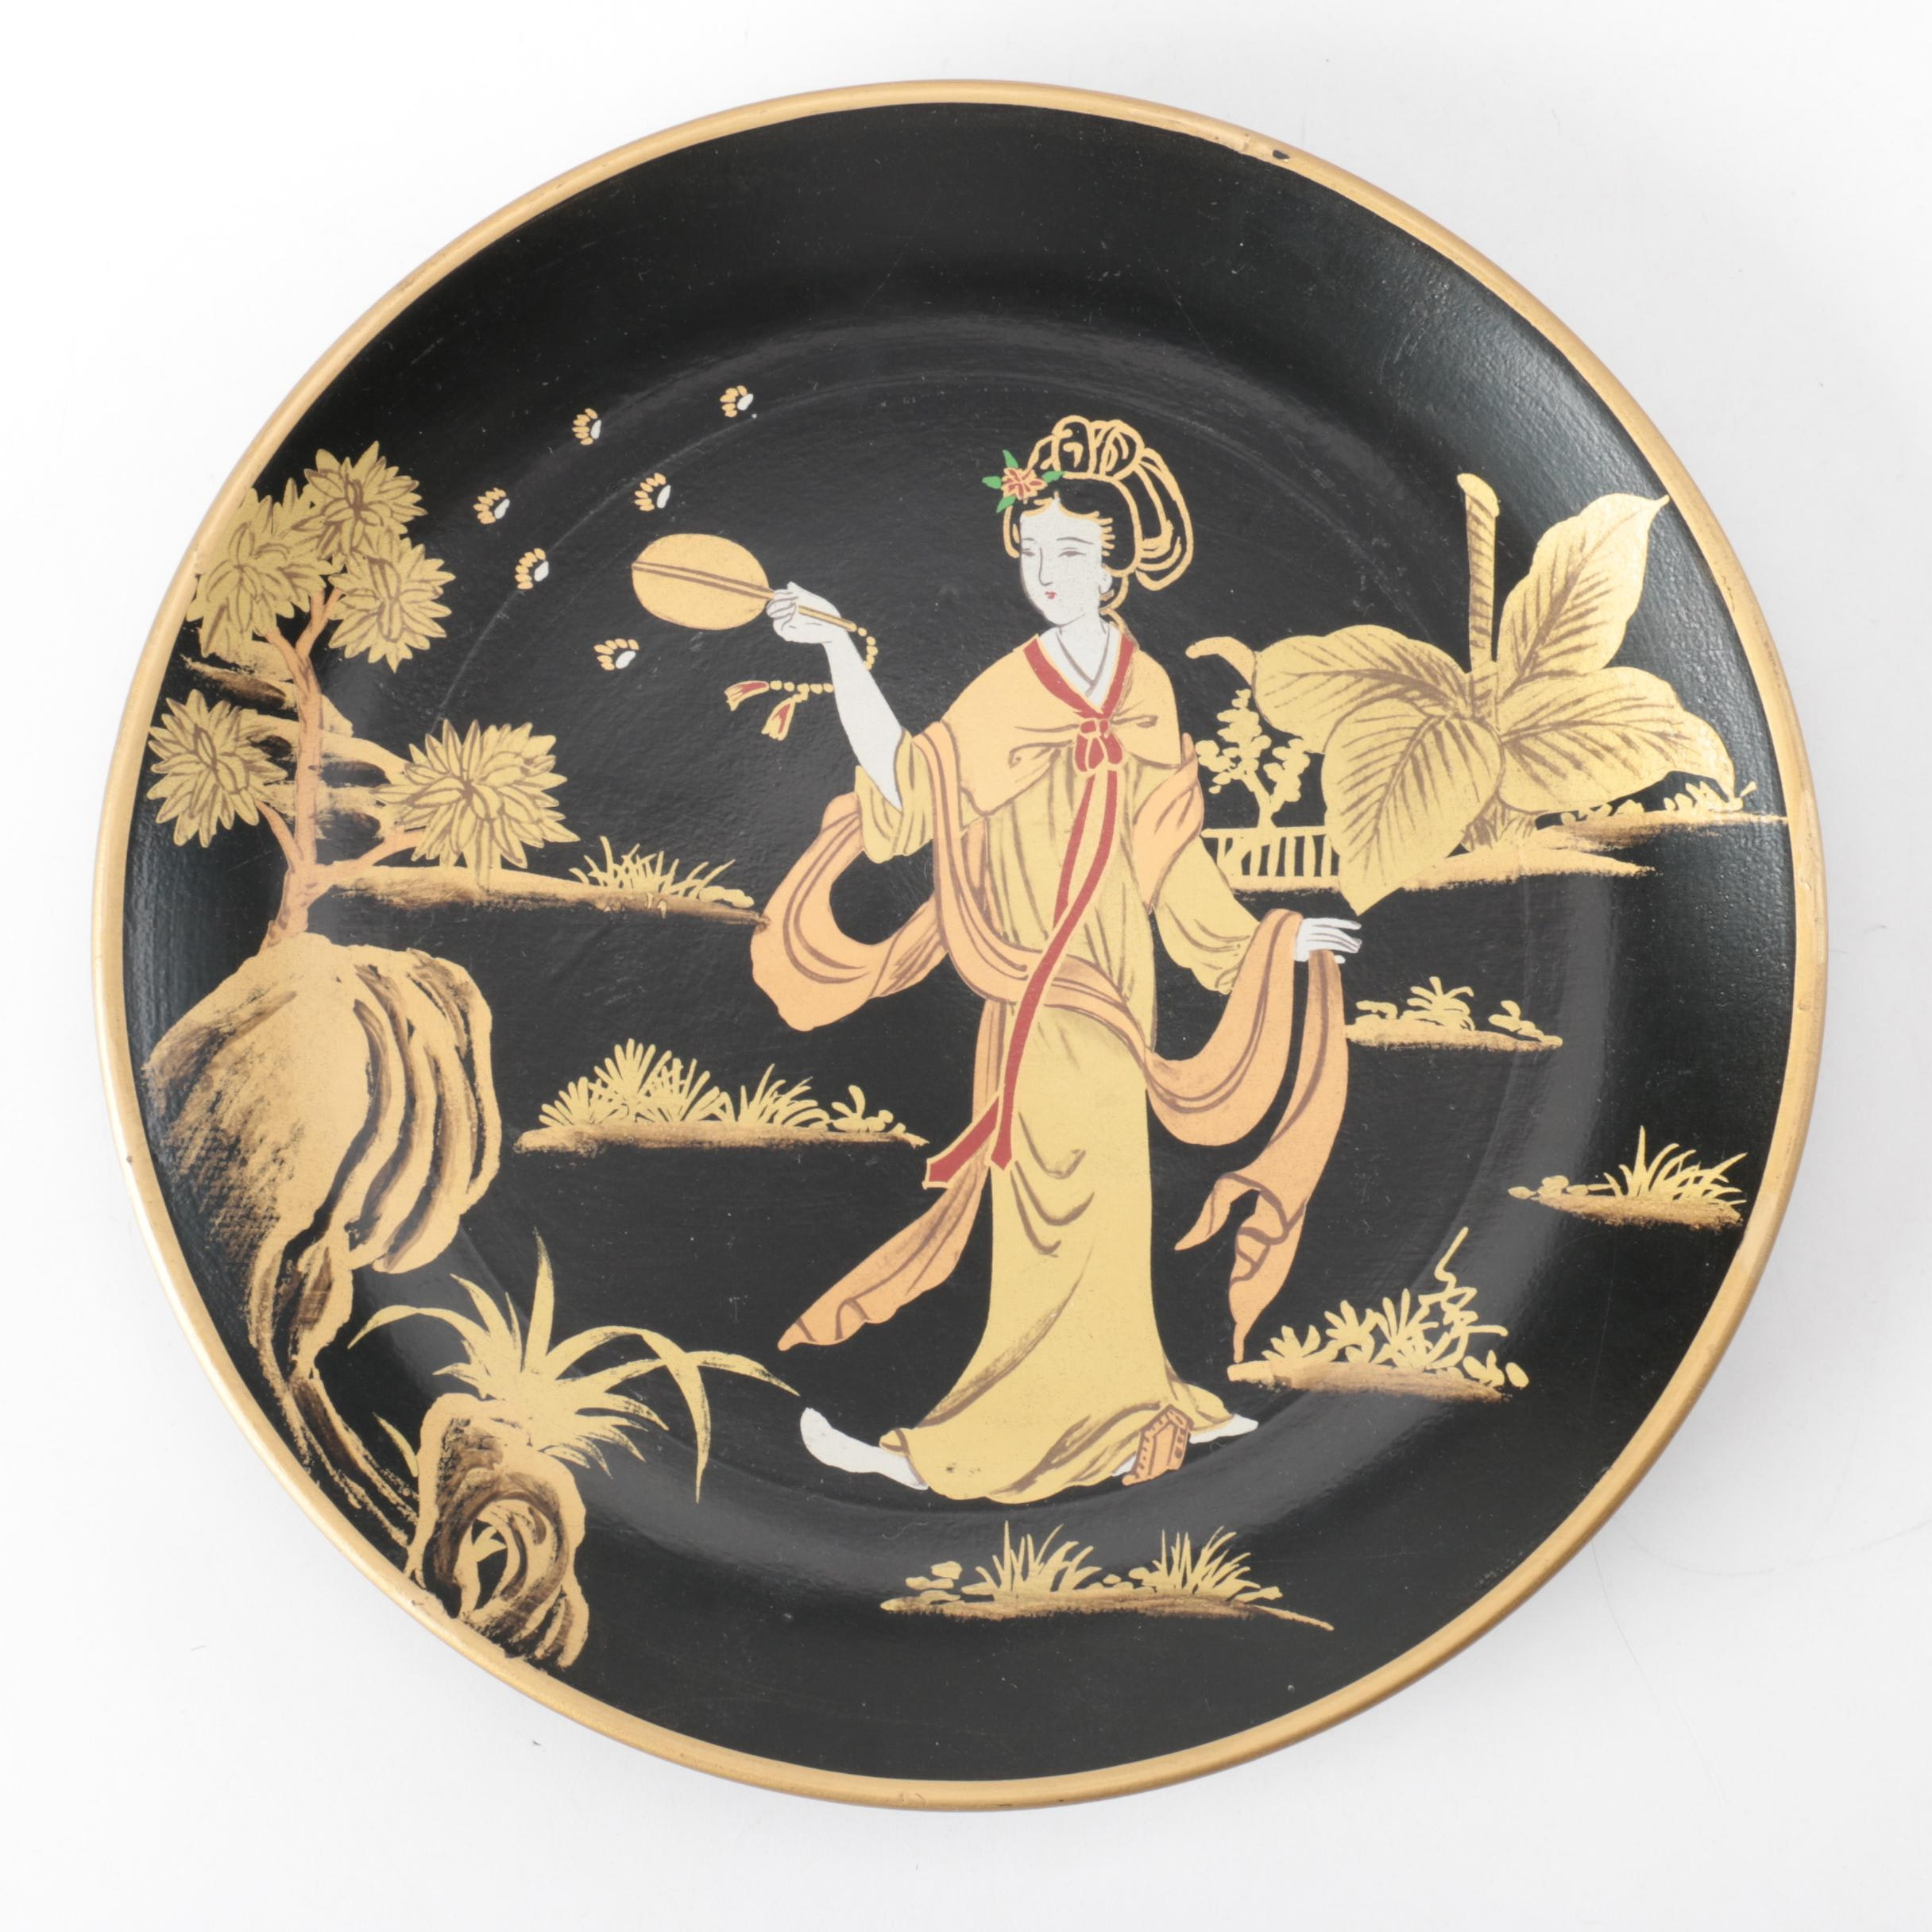 Japanese-Inspired Decorative Plate